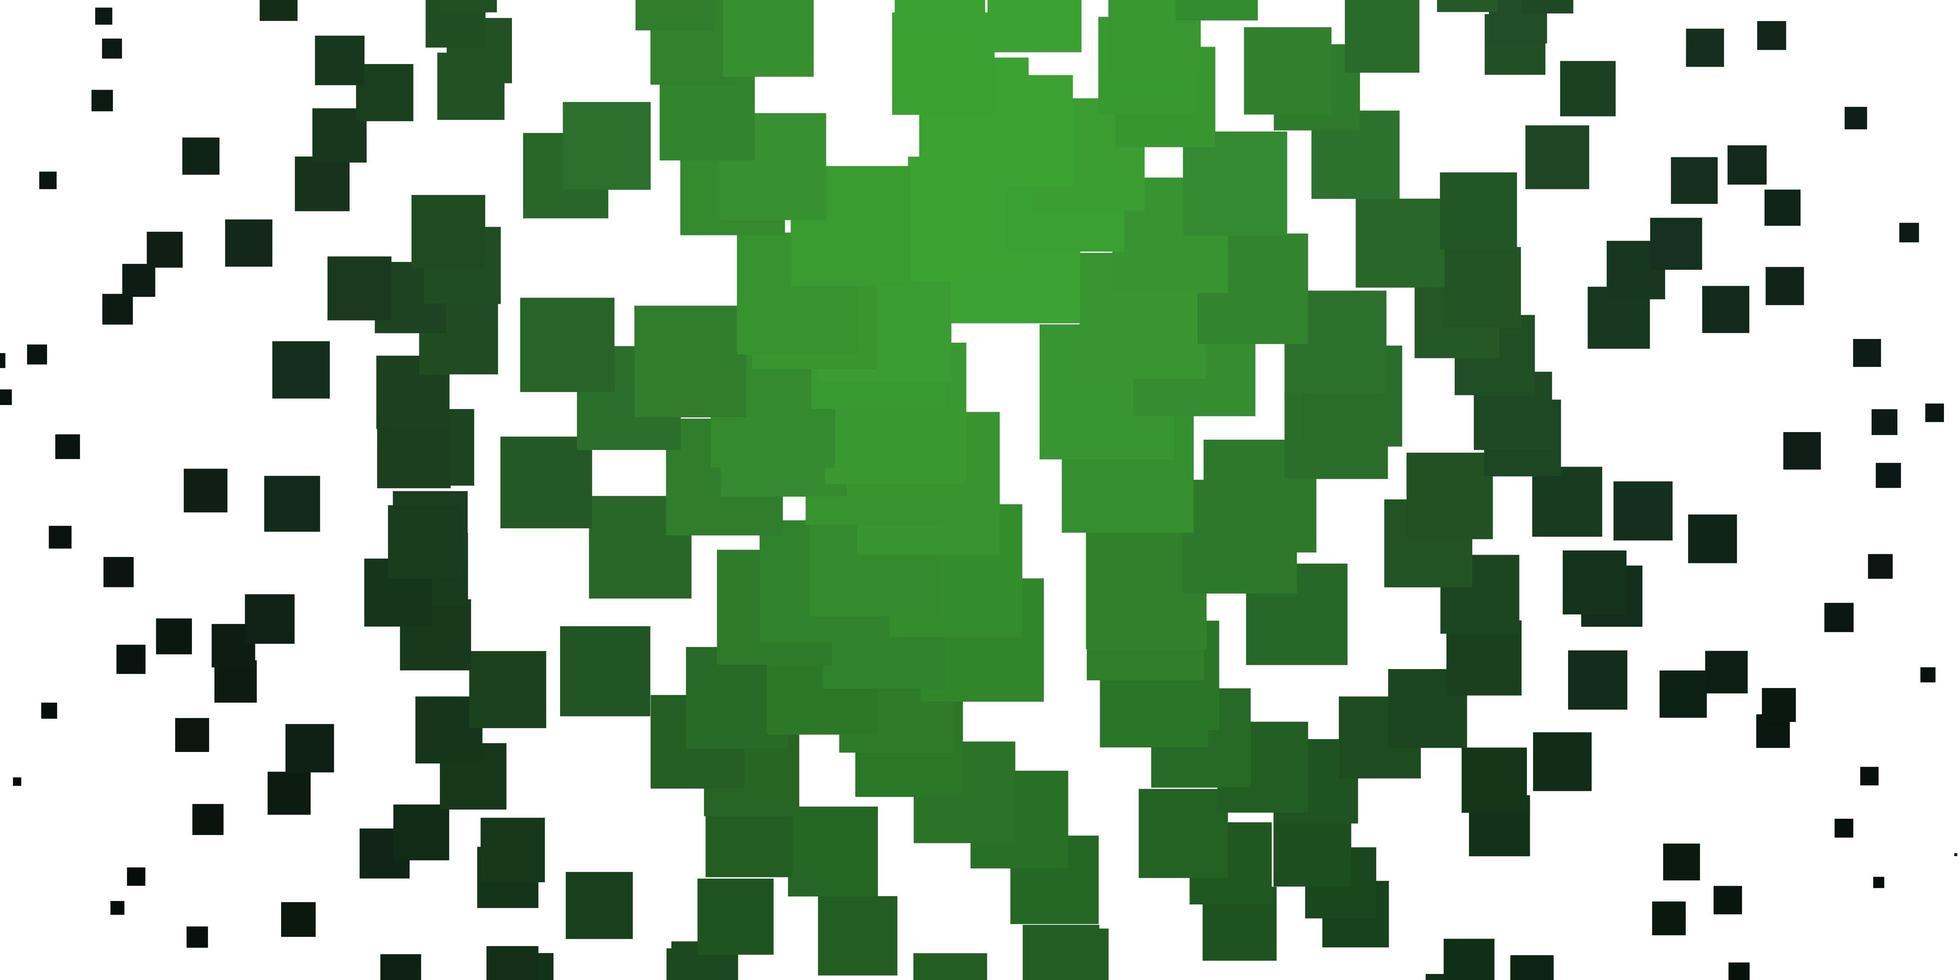 hellgrüne Vektorschablone in Rechtecken. vektor